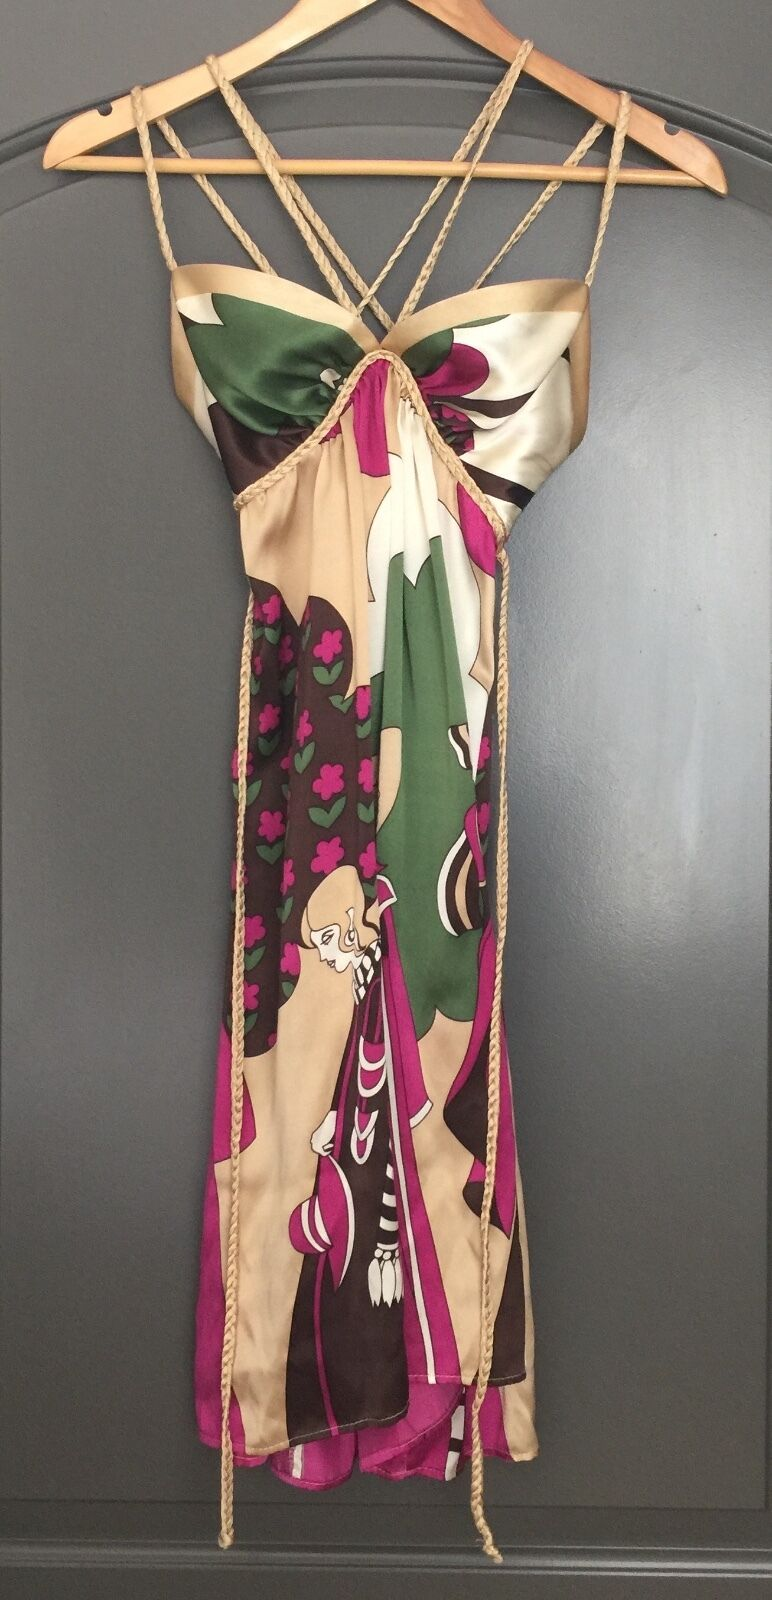 VOOM by Joy Han 100% Silk Cage Dress Braided Strappy gold Multi Print Sz SMALL